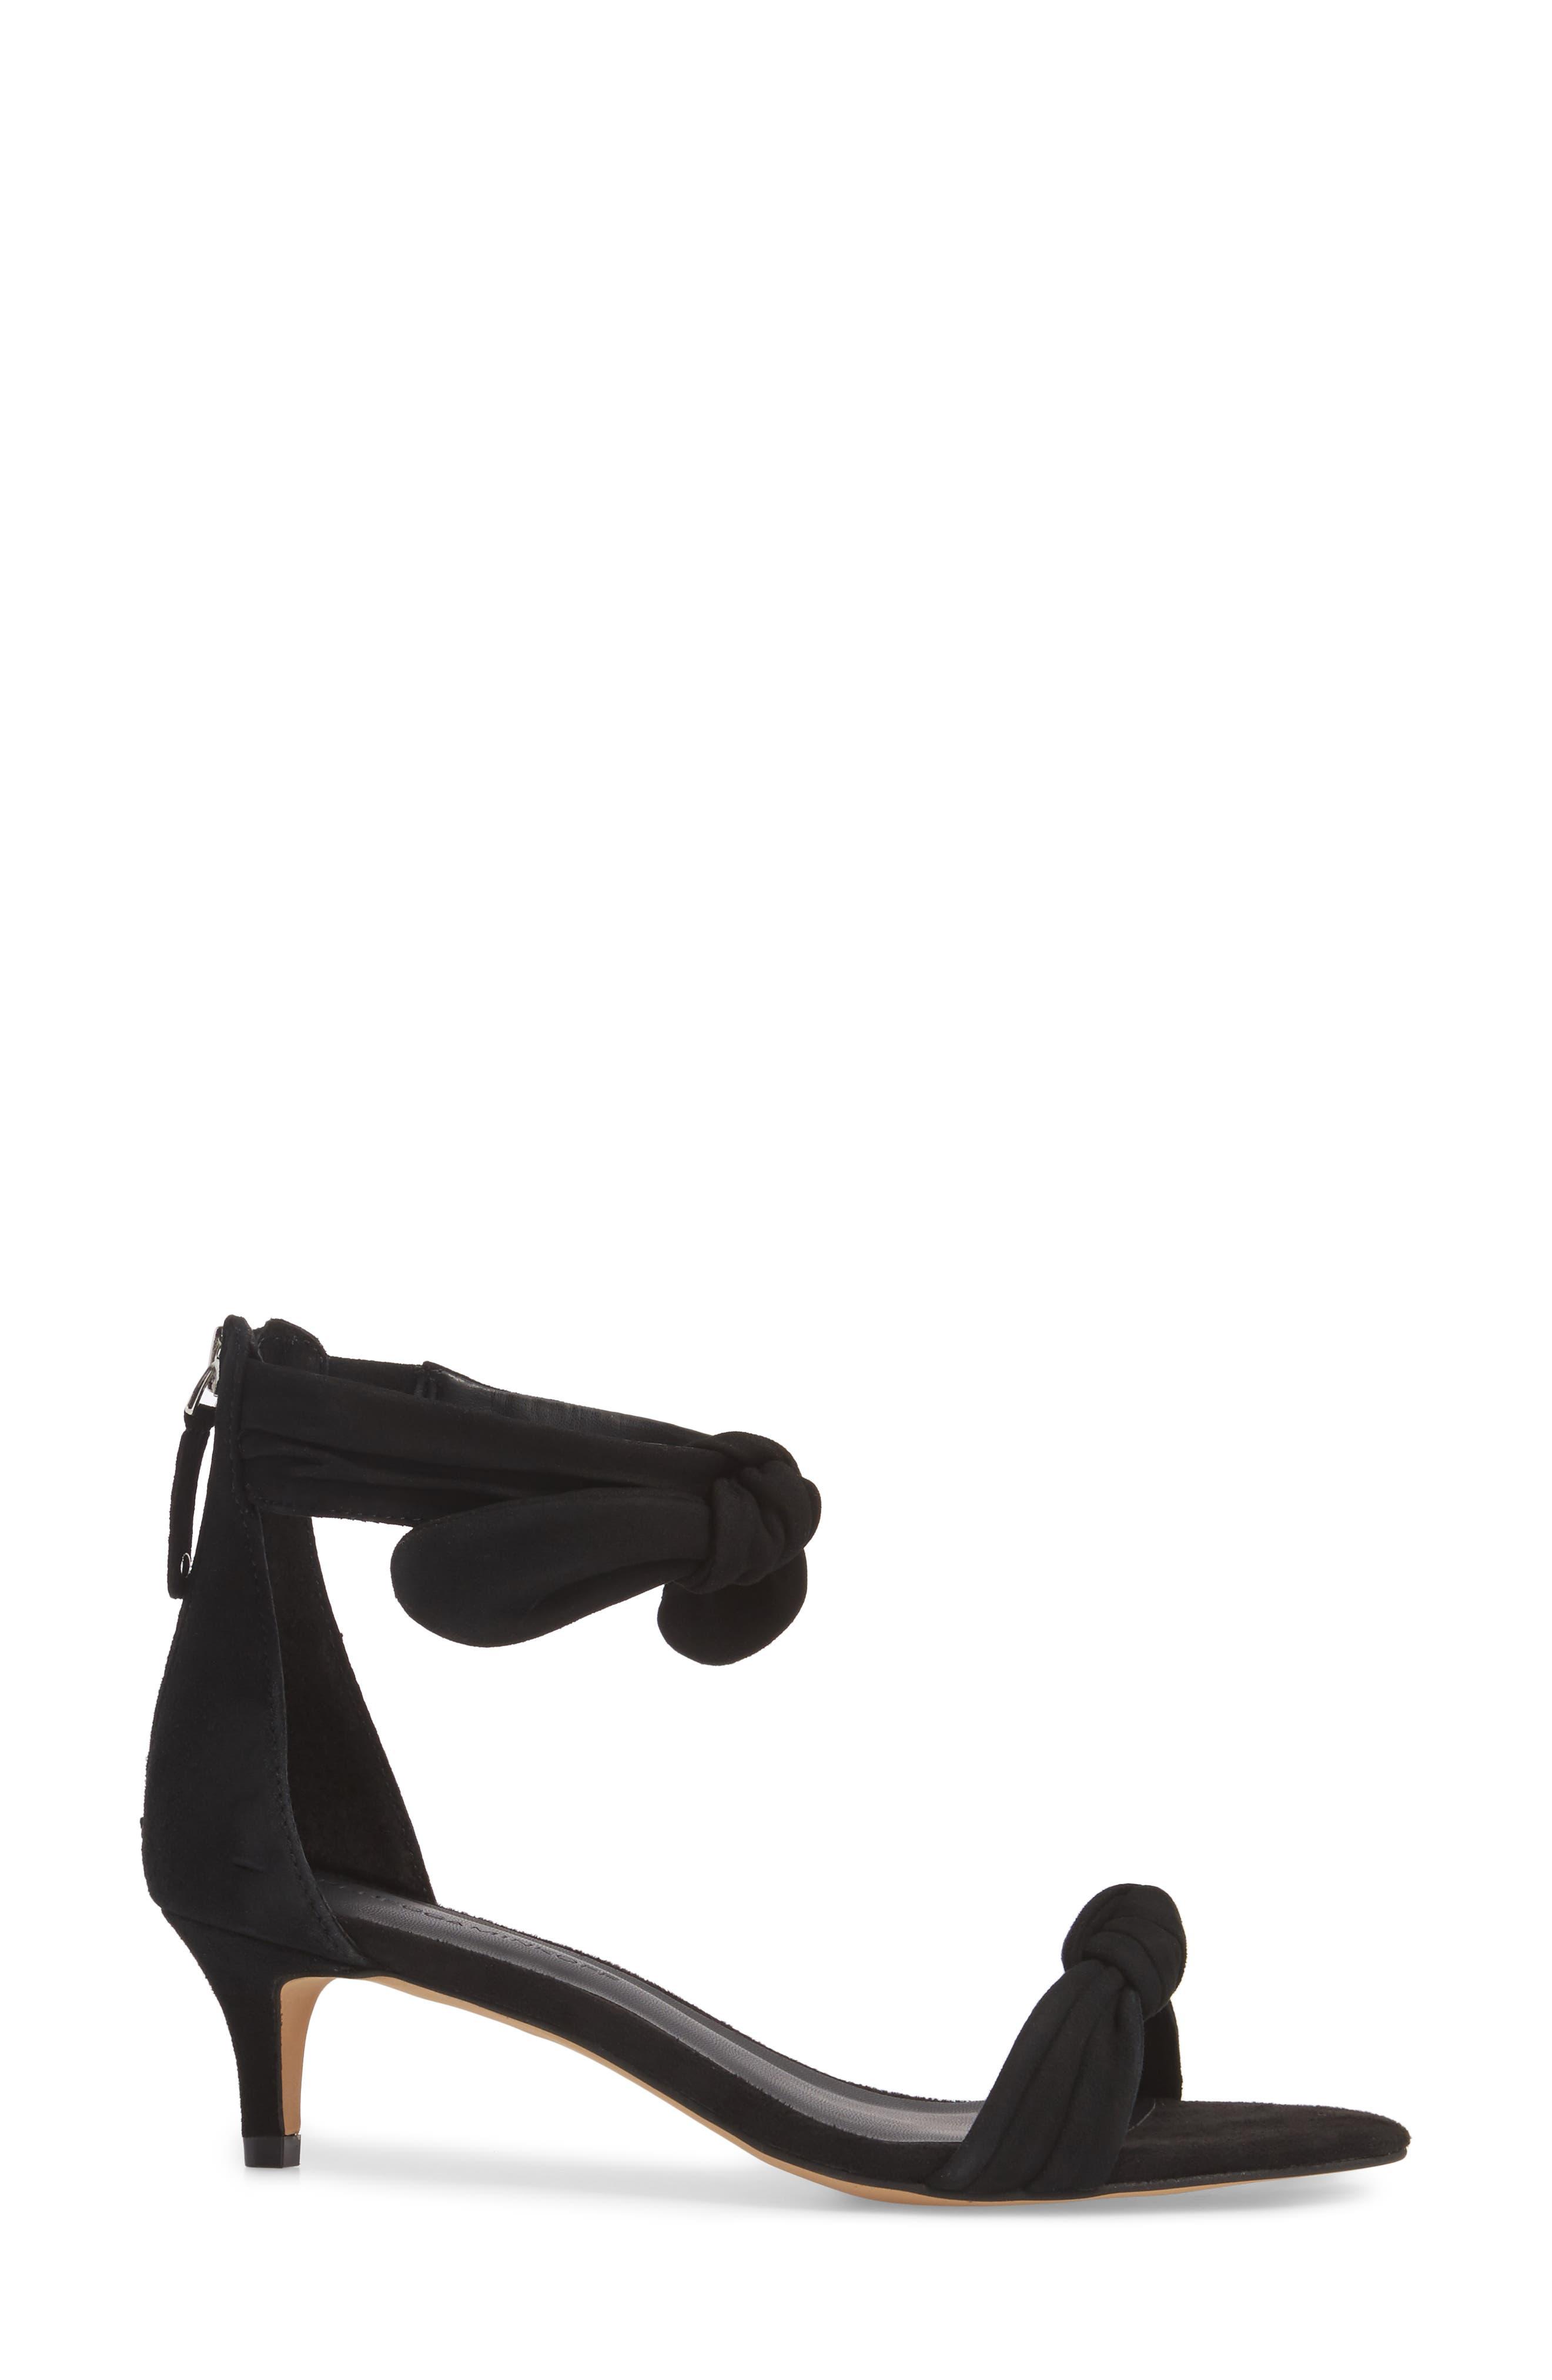 Alternate Image 3  - Rebecca Minkoff Kaley Knotted Kitten Heel Sandal (Women)